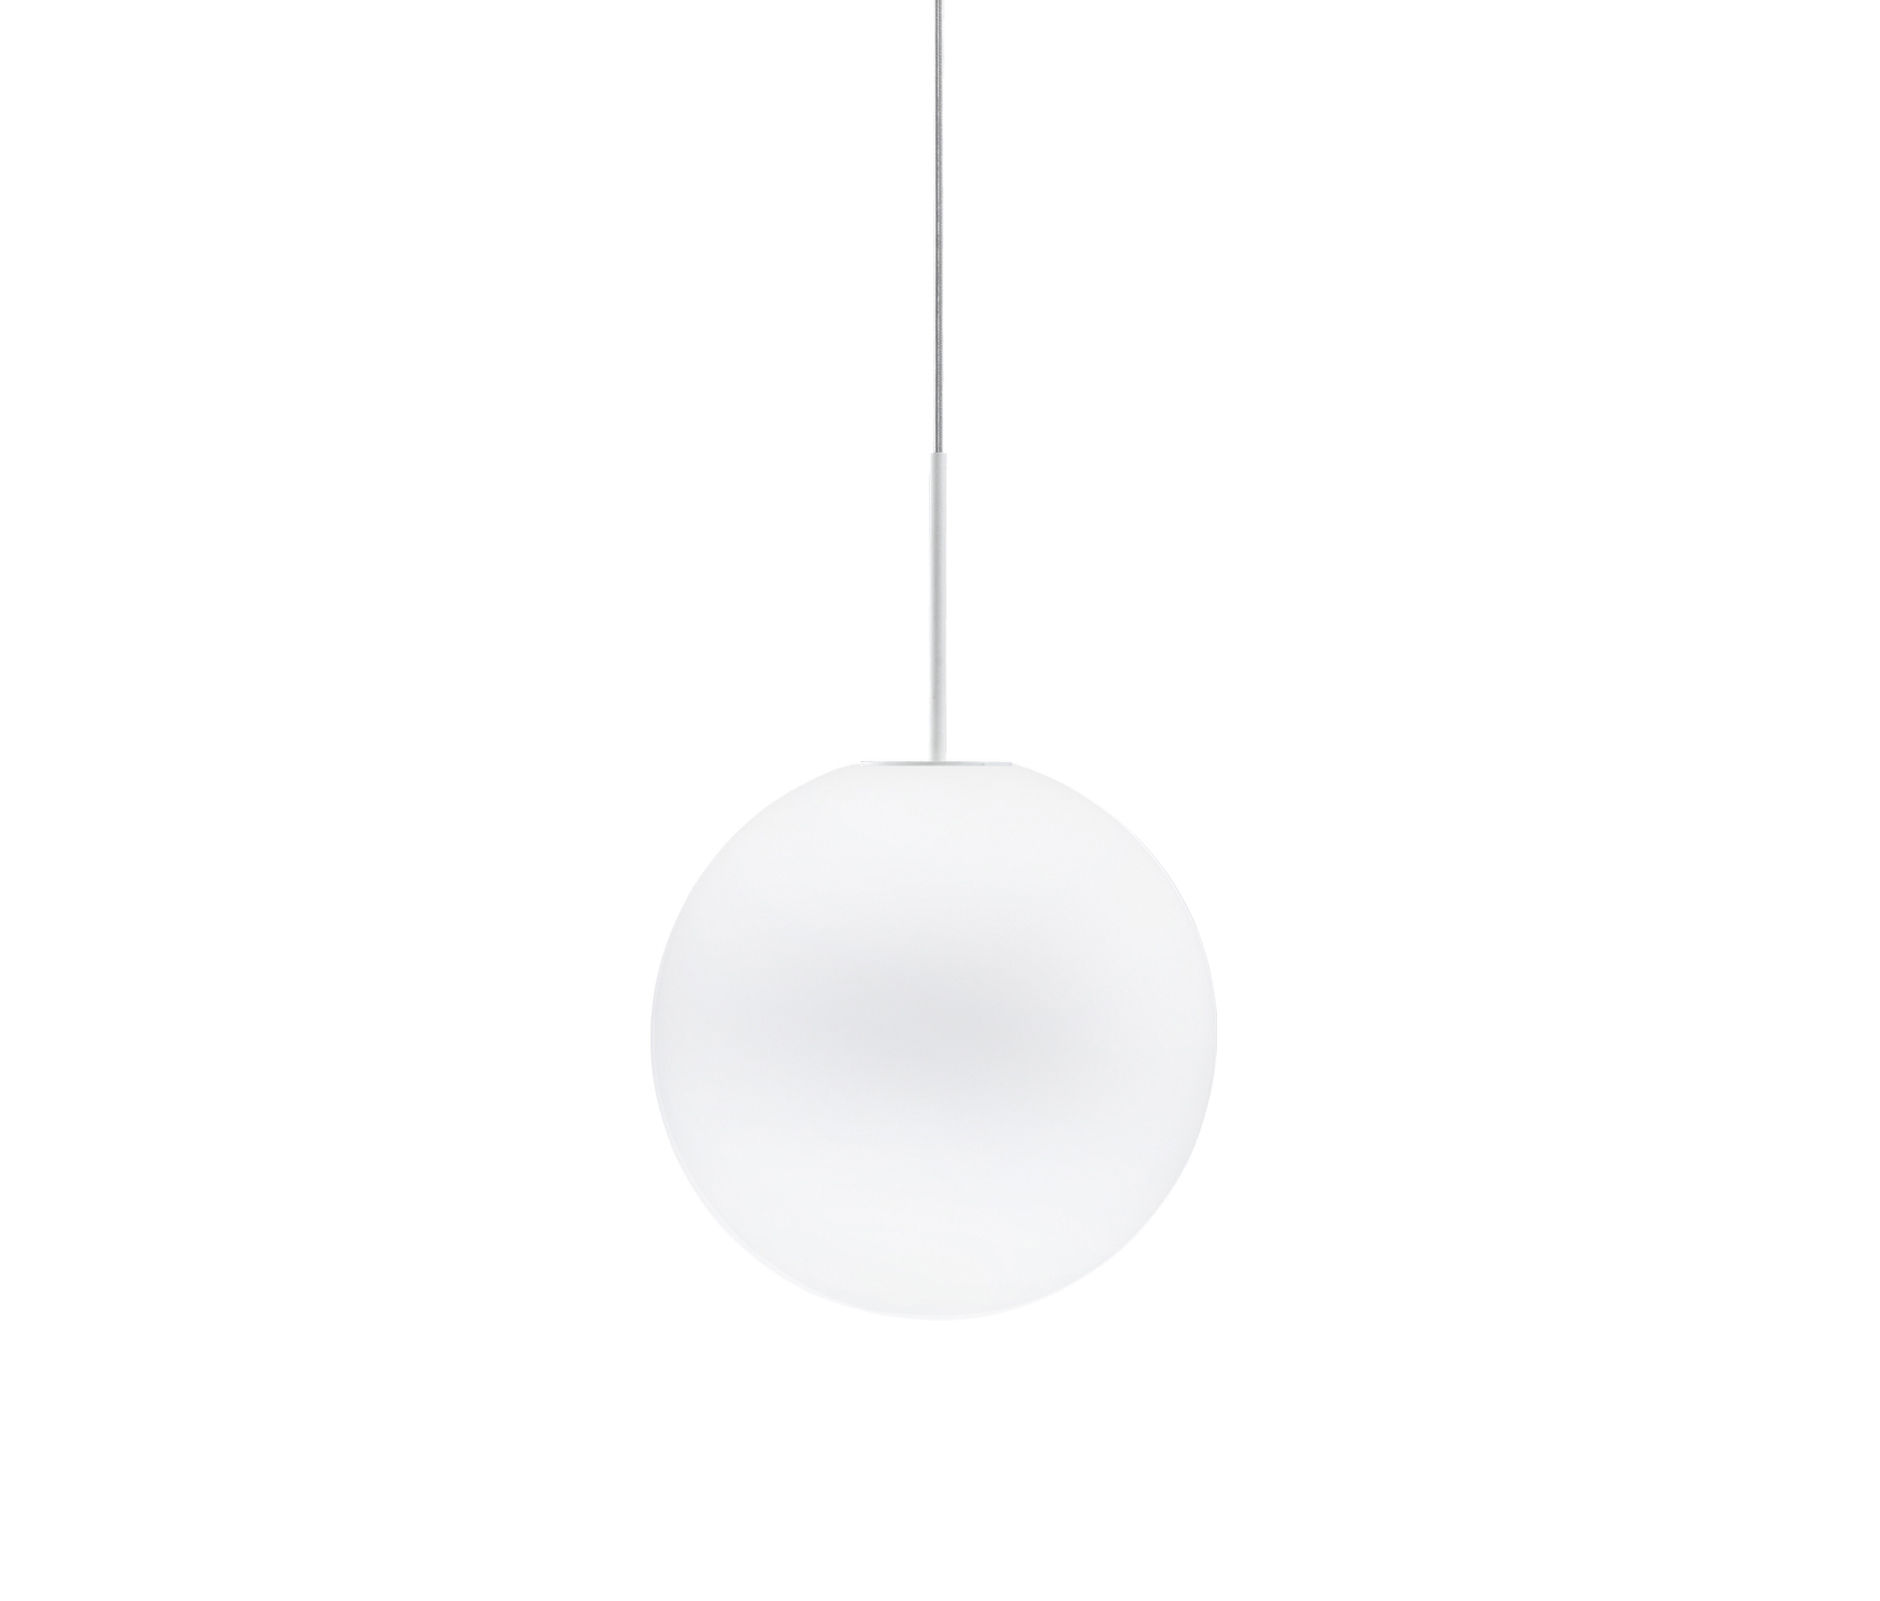 Luminaire - Suspensions - Suspension Sfera Ø 14 cm - Fabbian - Blanc - Ø 14 cm - Verre